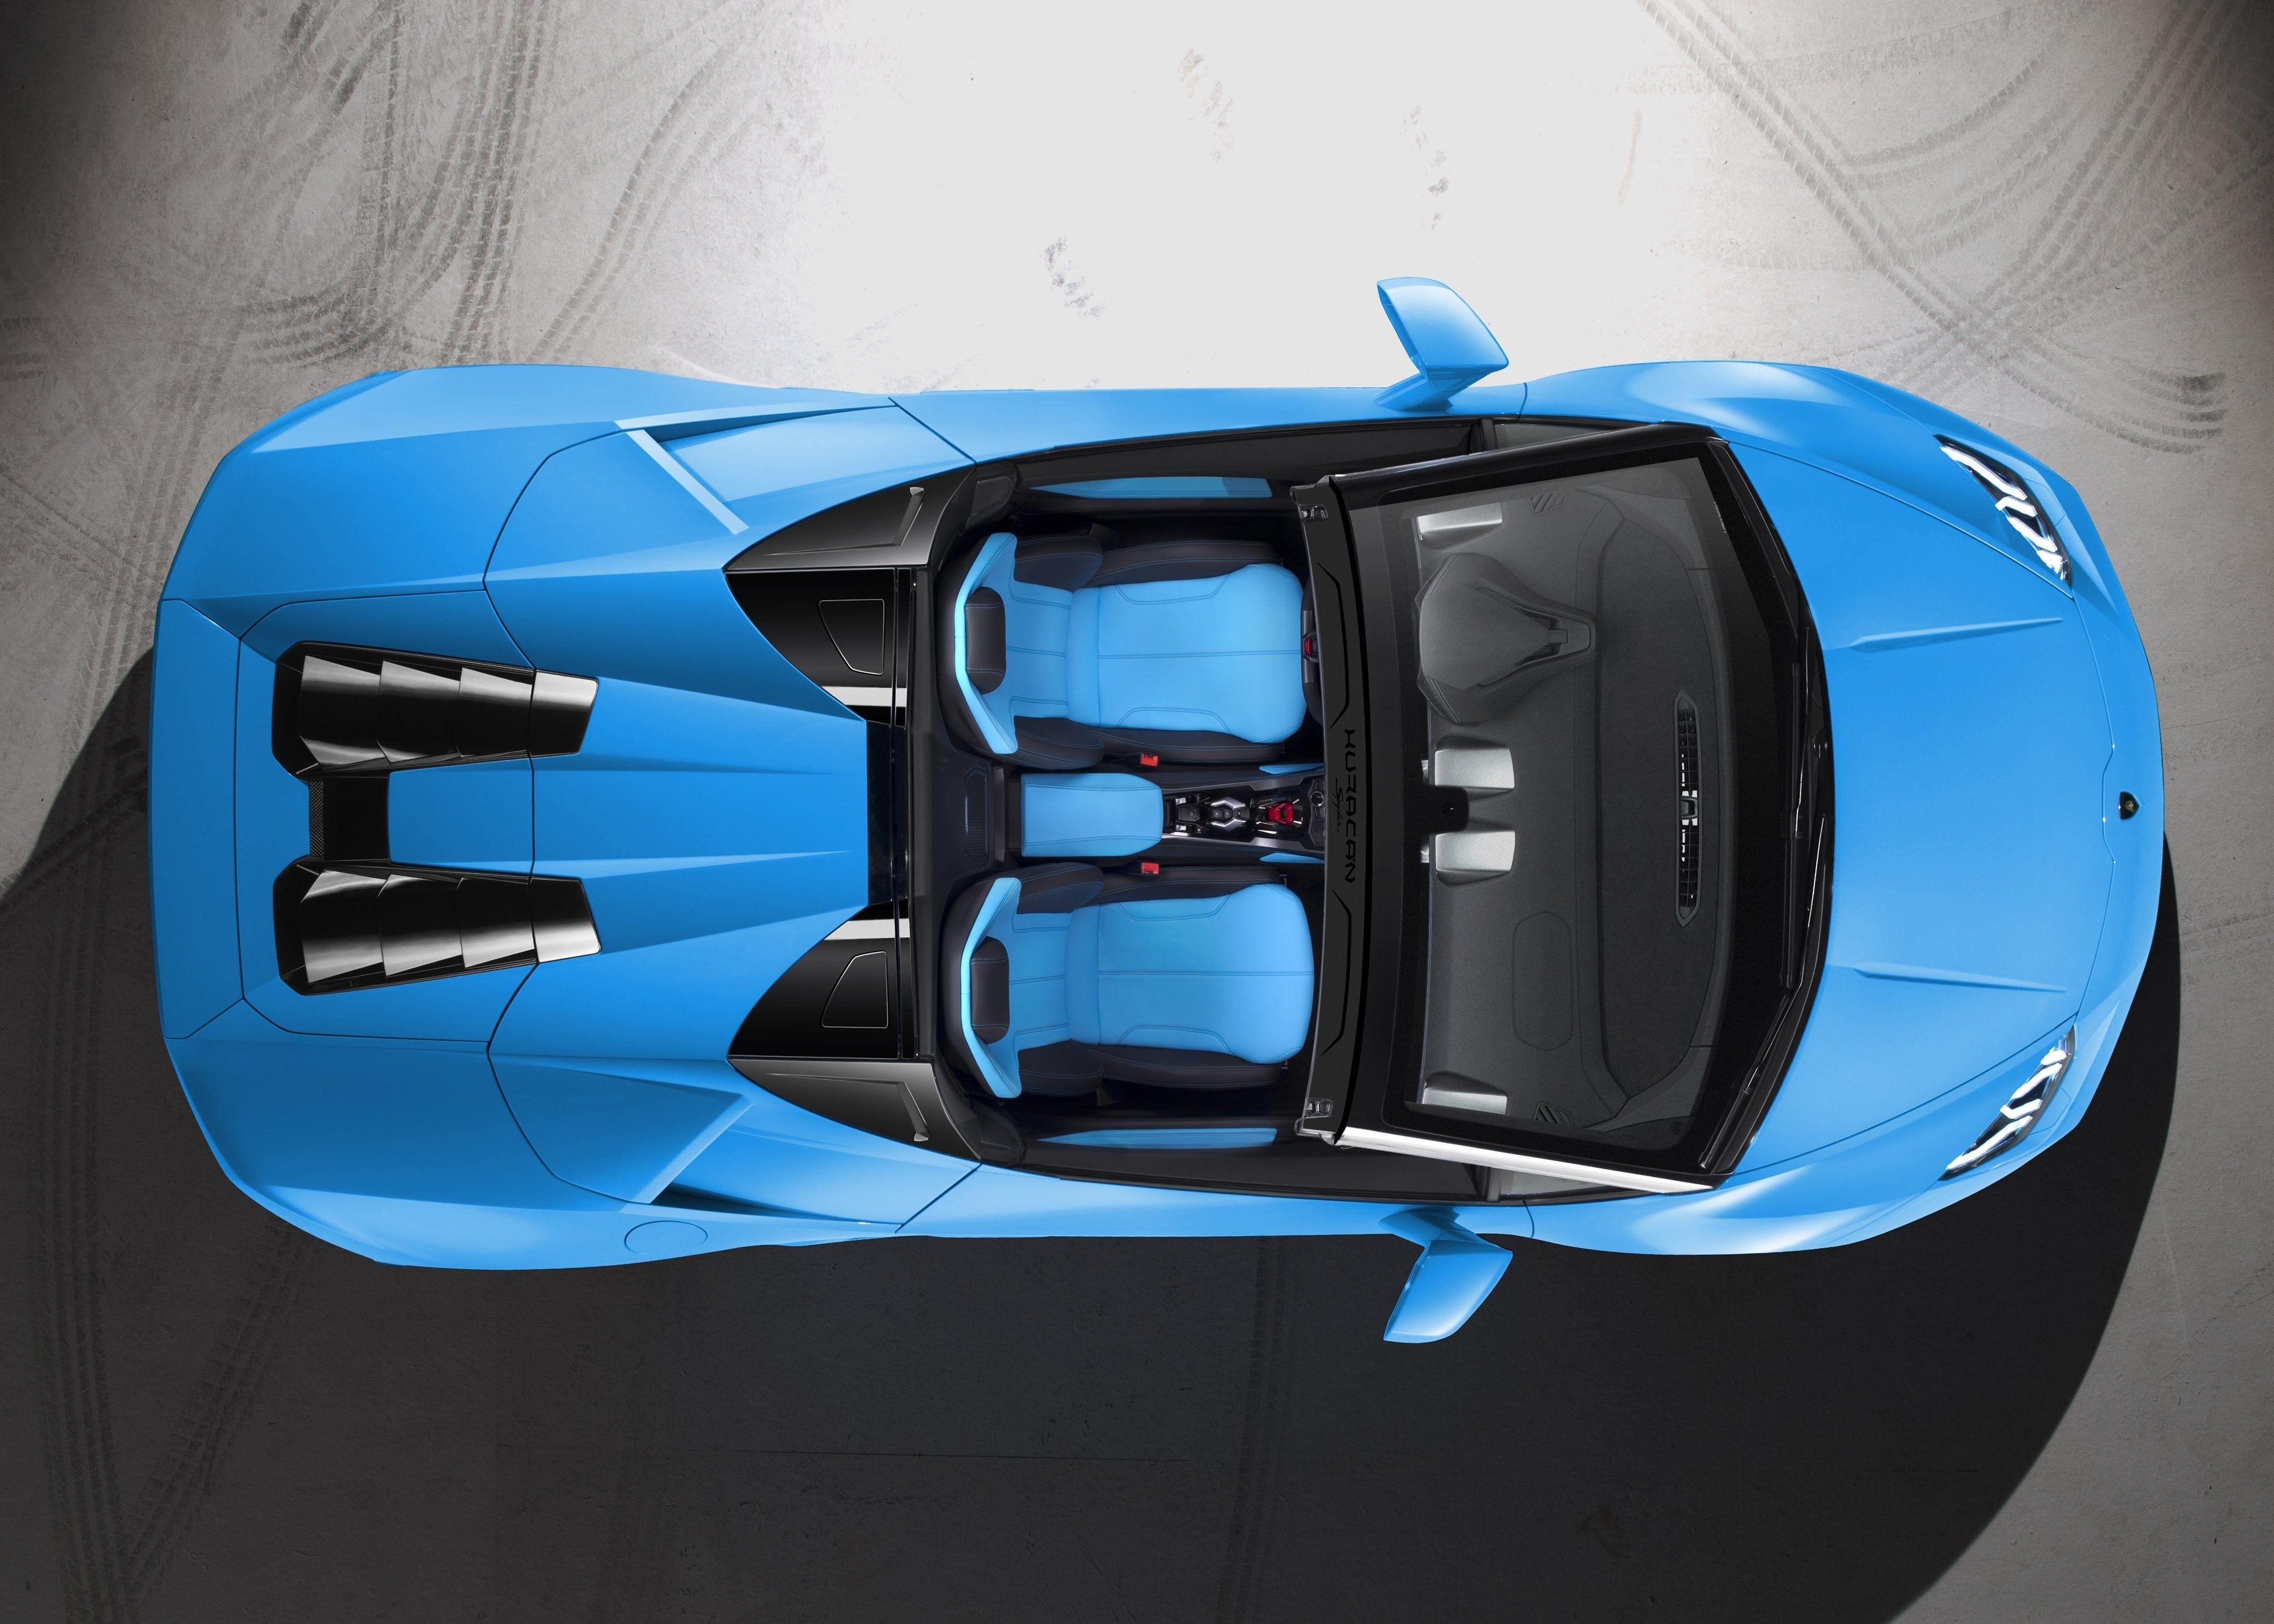 5f8946792be93418ace621e7f8e96727 Interesting Hinh Anh Xe Porsche 918 Spyder Cars Trend